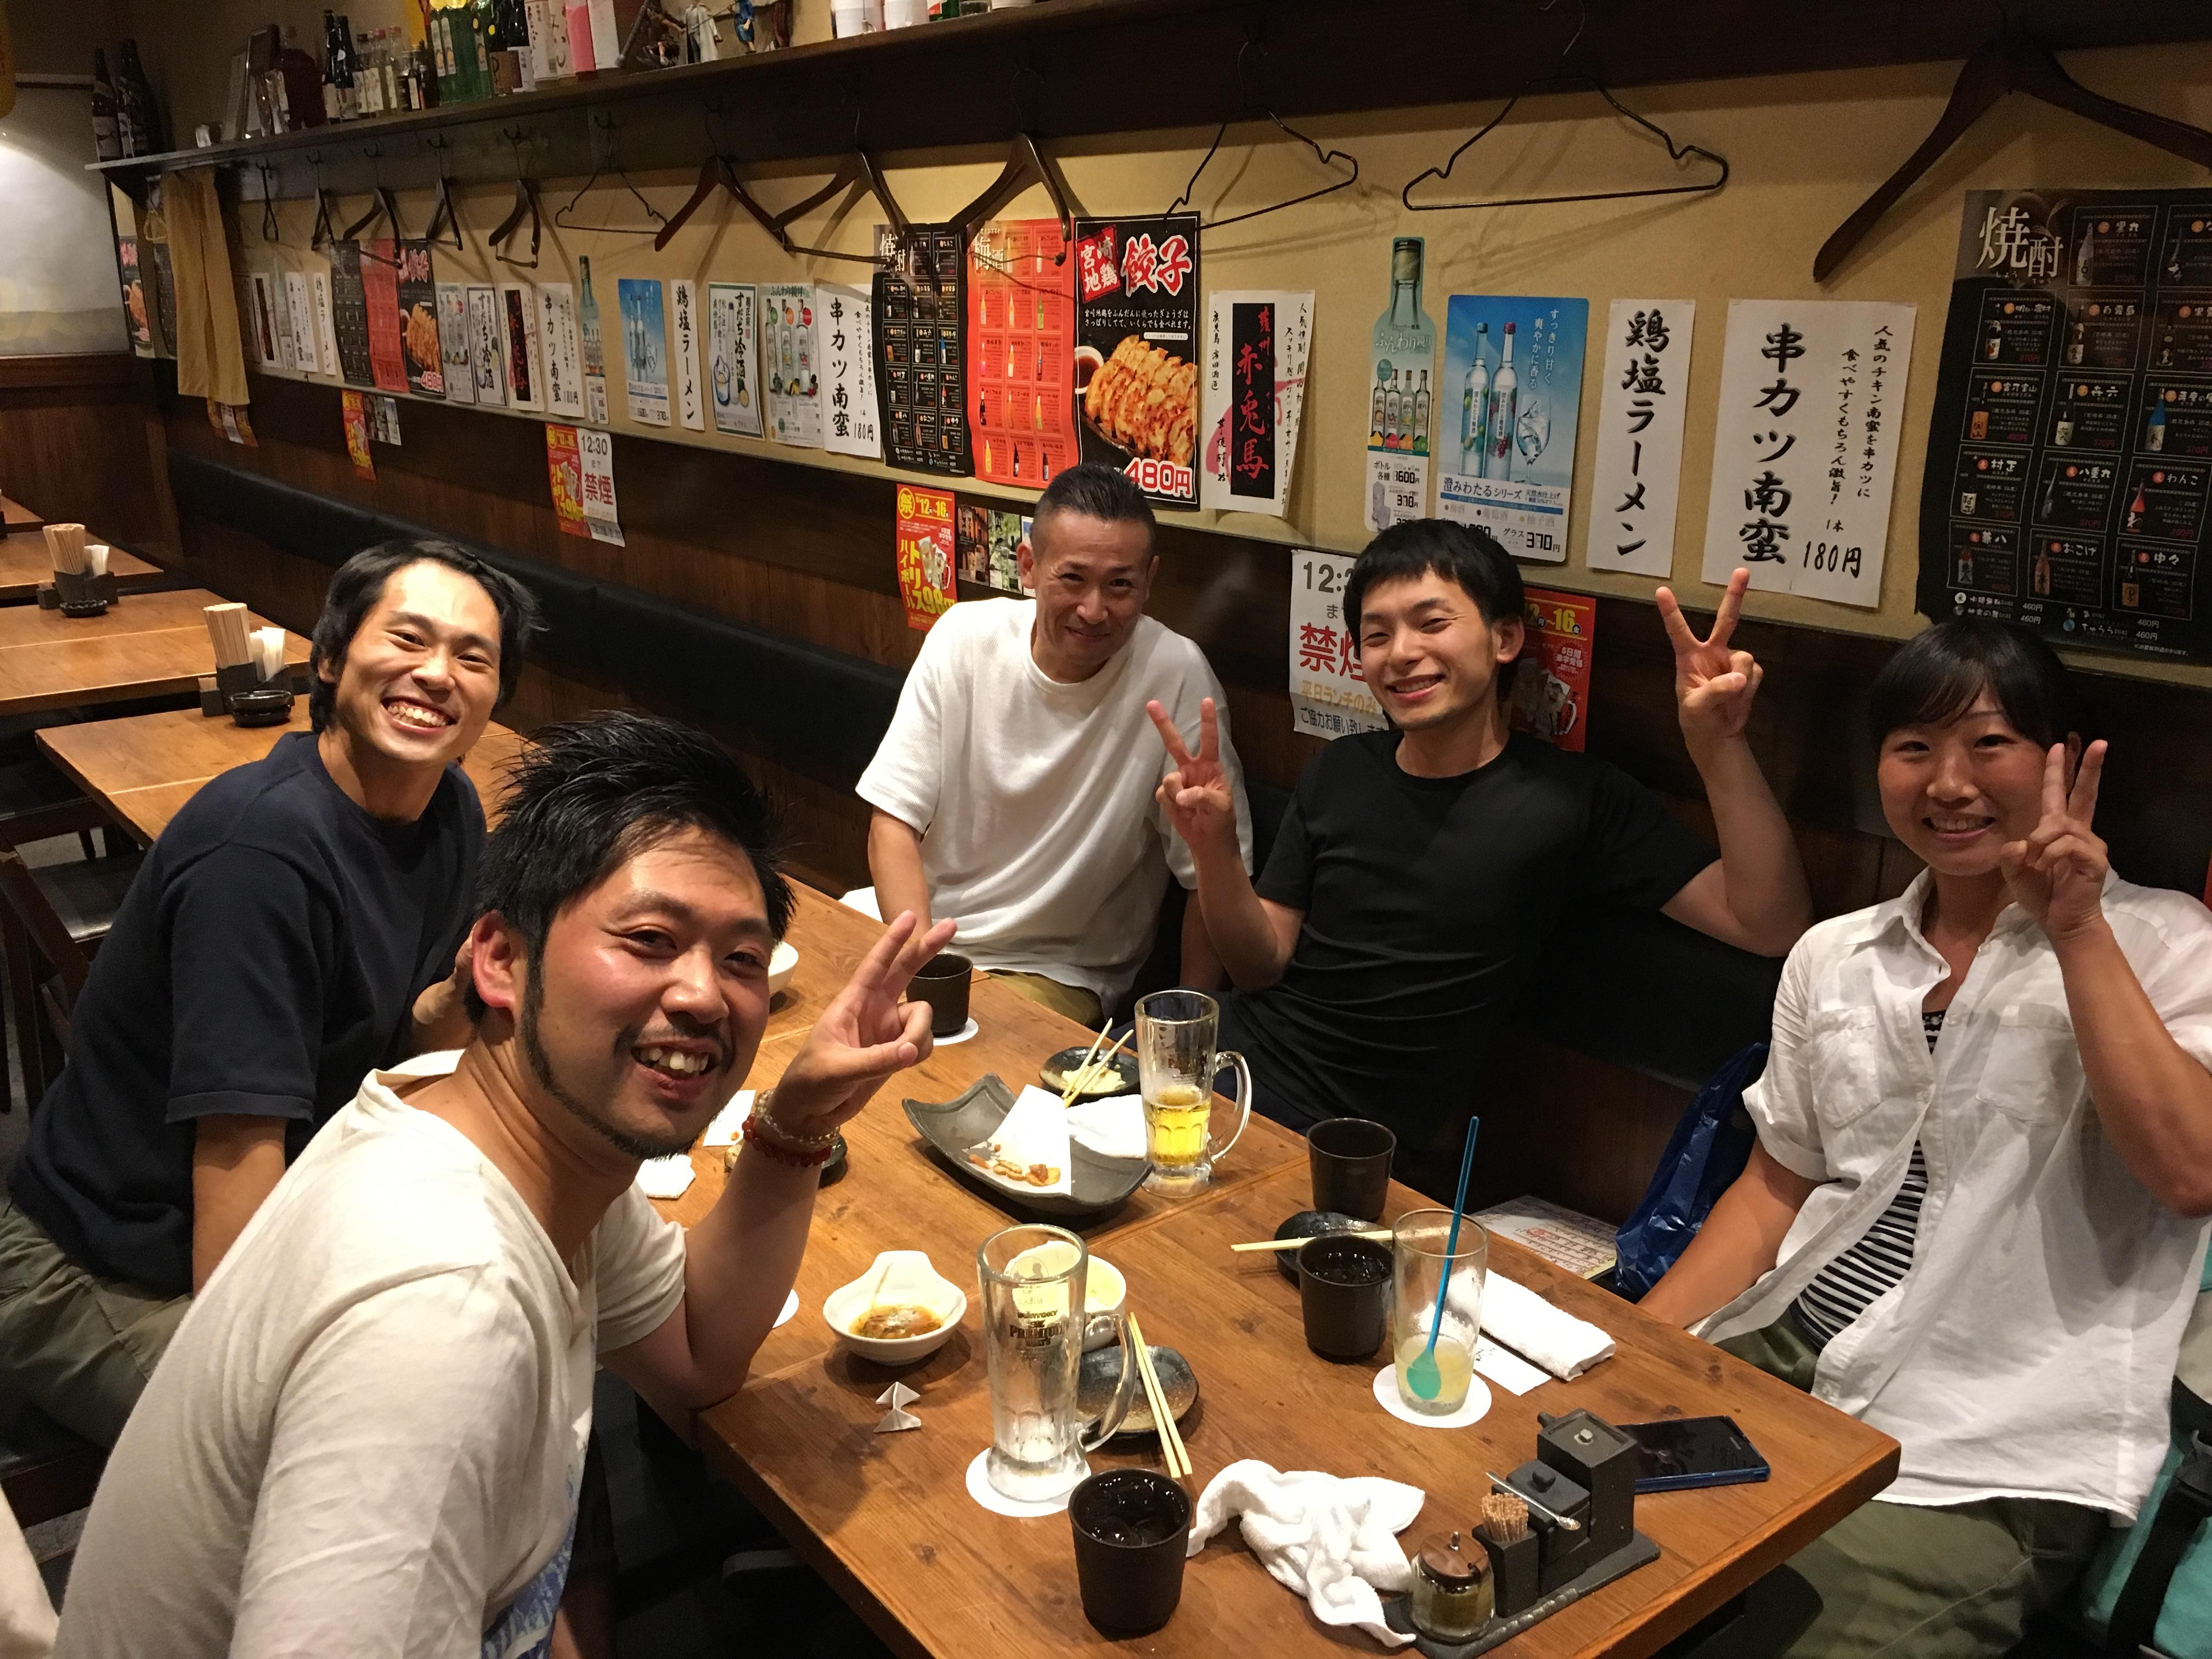 iphone-2016-09-09-23-04-10-230